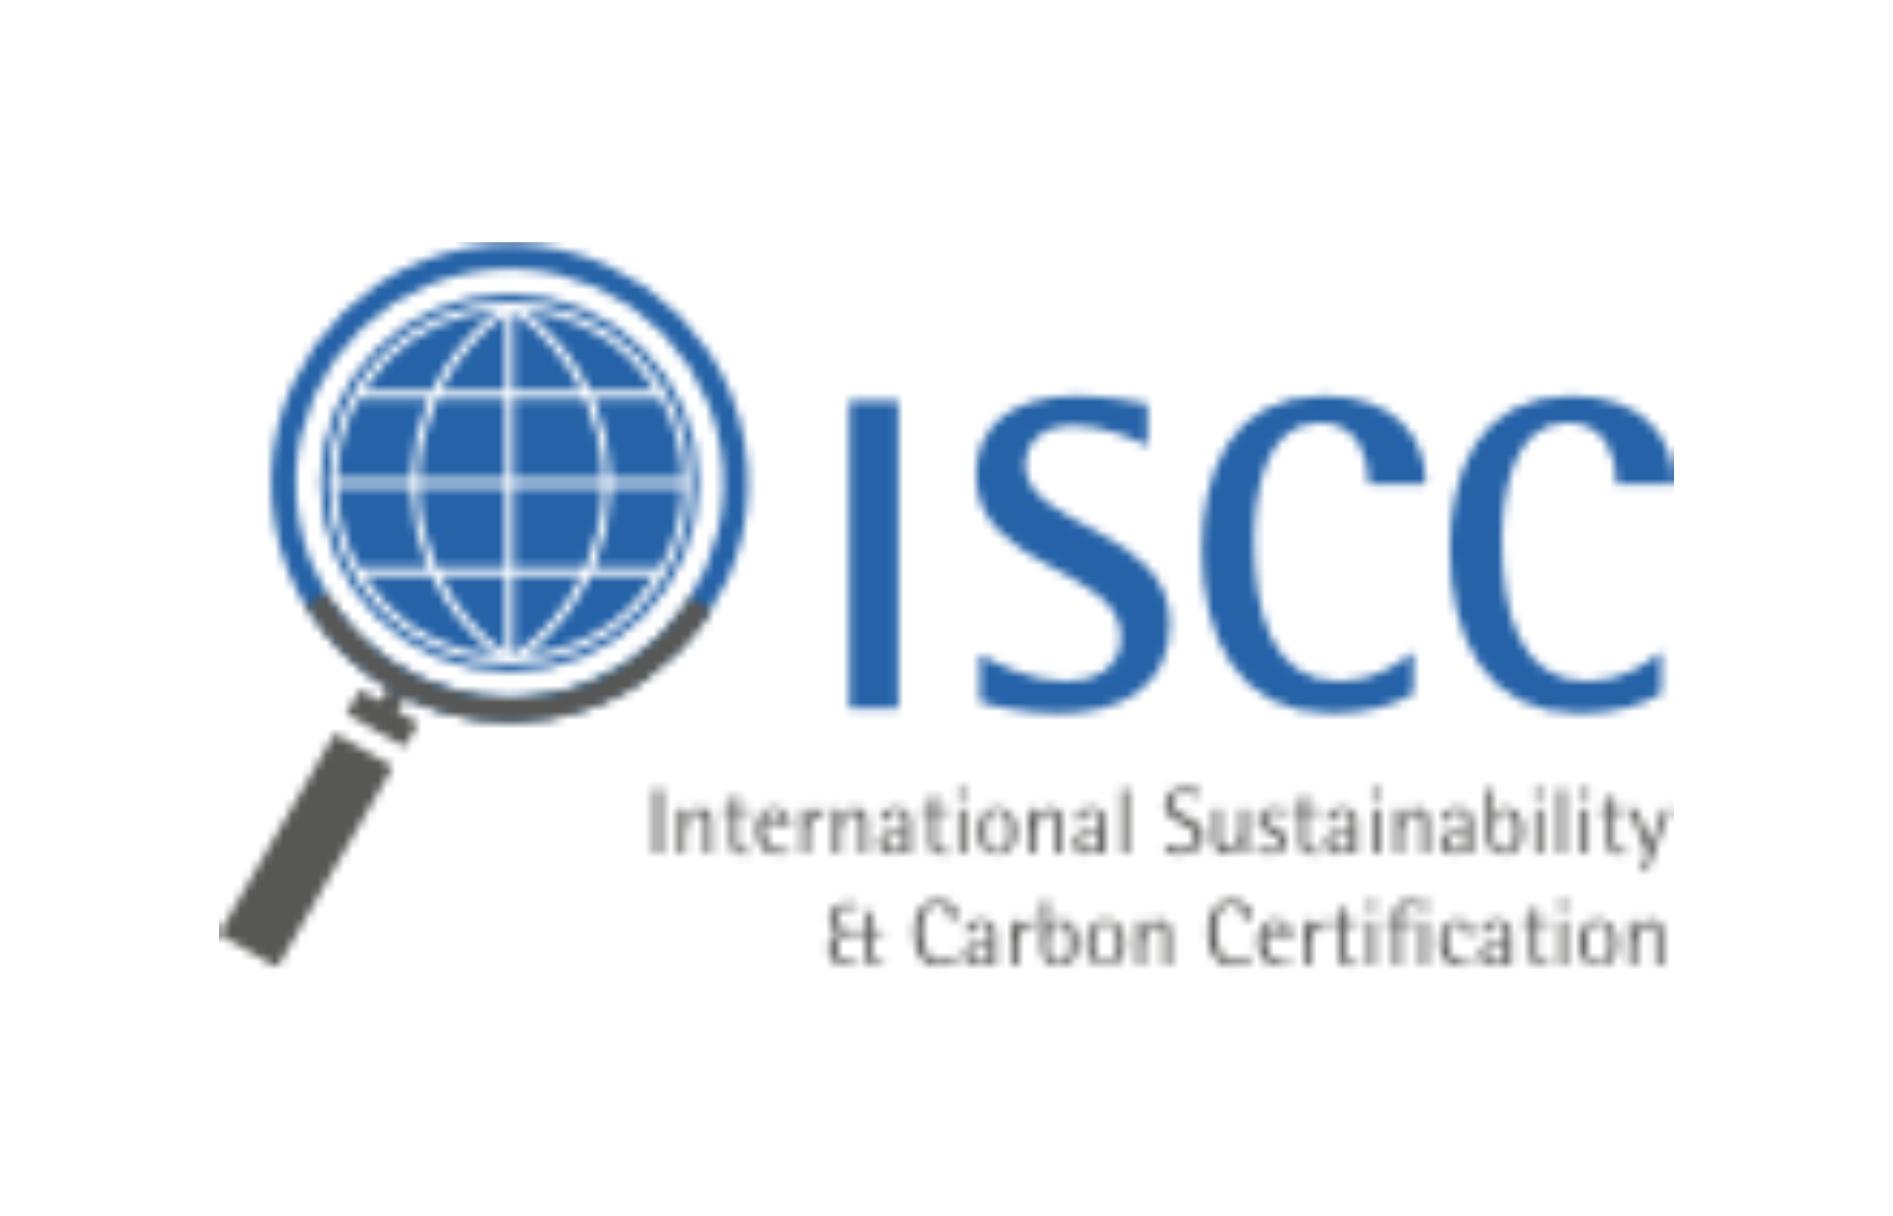 iscc-partner-logo